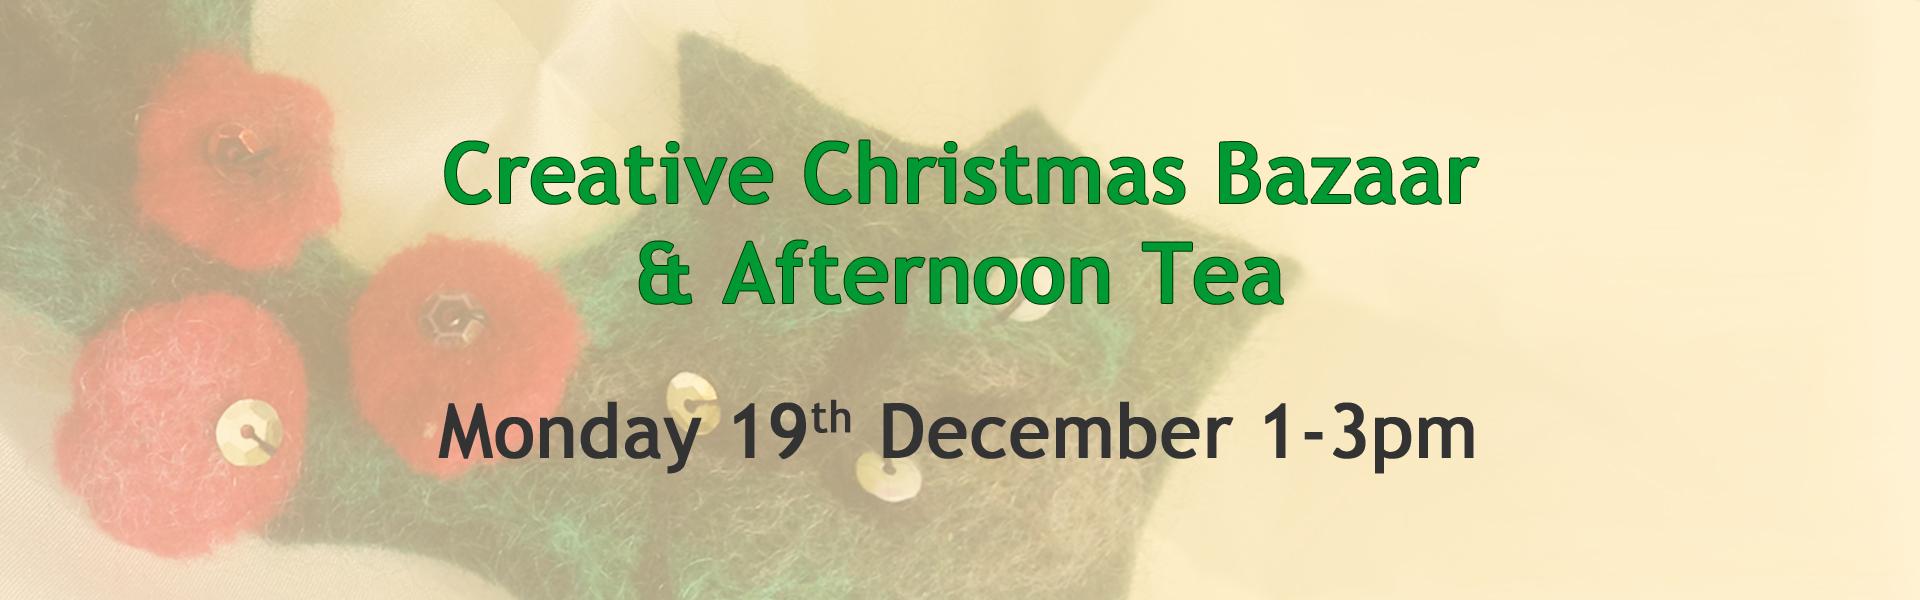 Creative Christmas Bazaar and Afternoon Tea